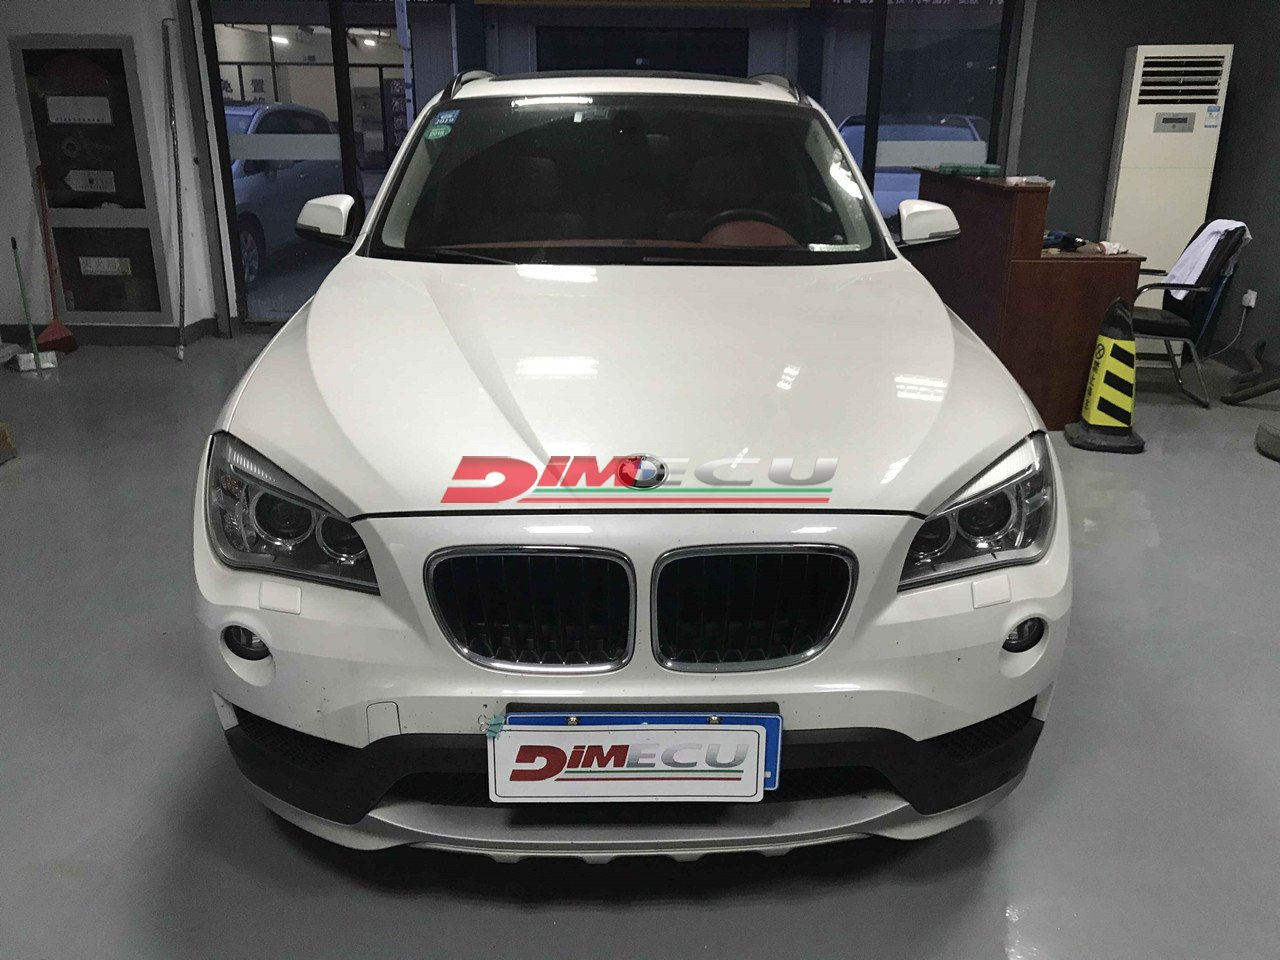 BMW X1 2.0T  刷写Dimecu